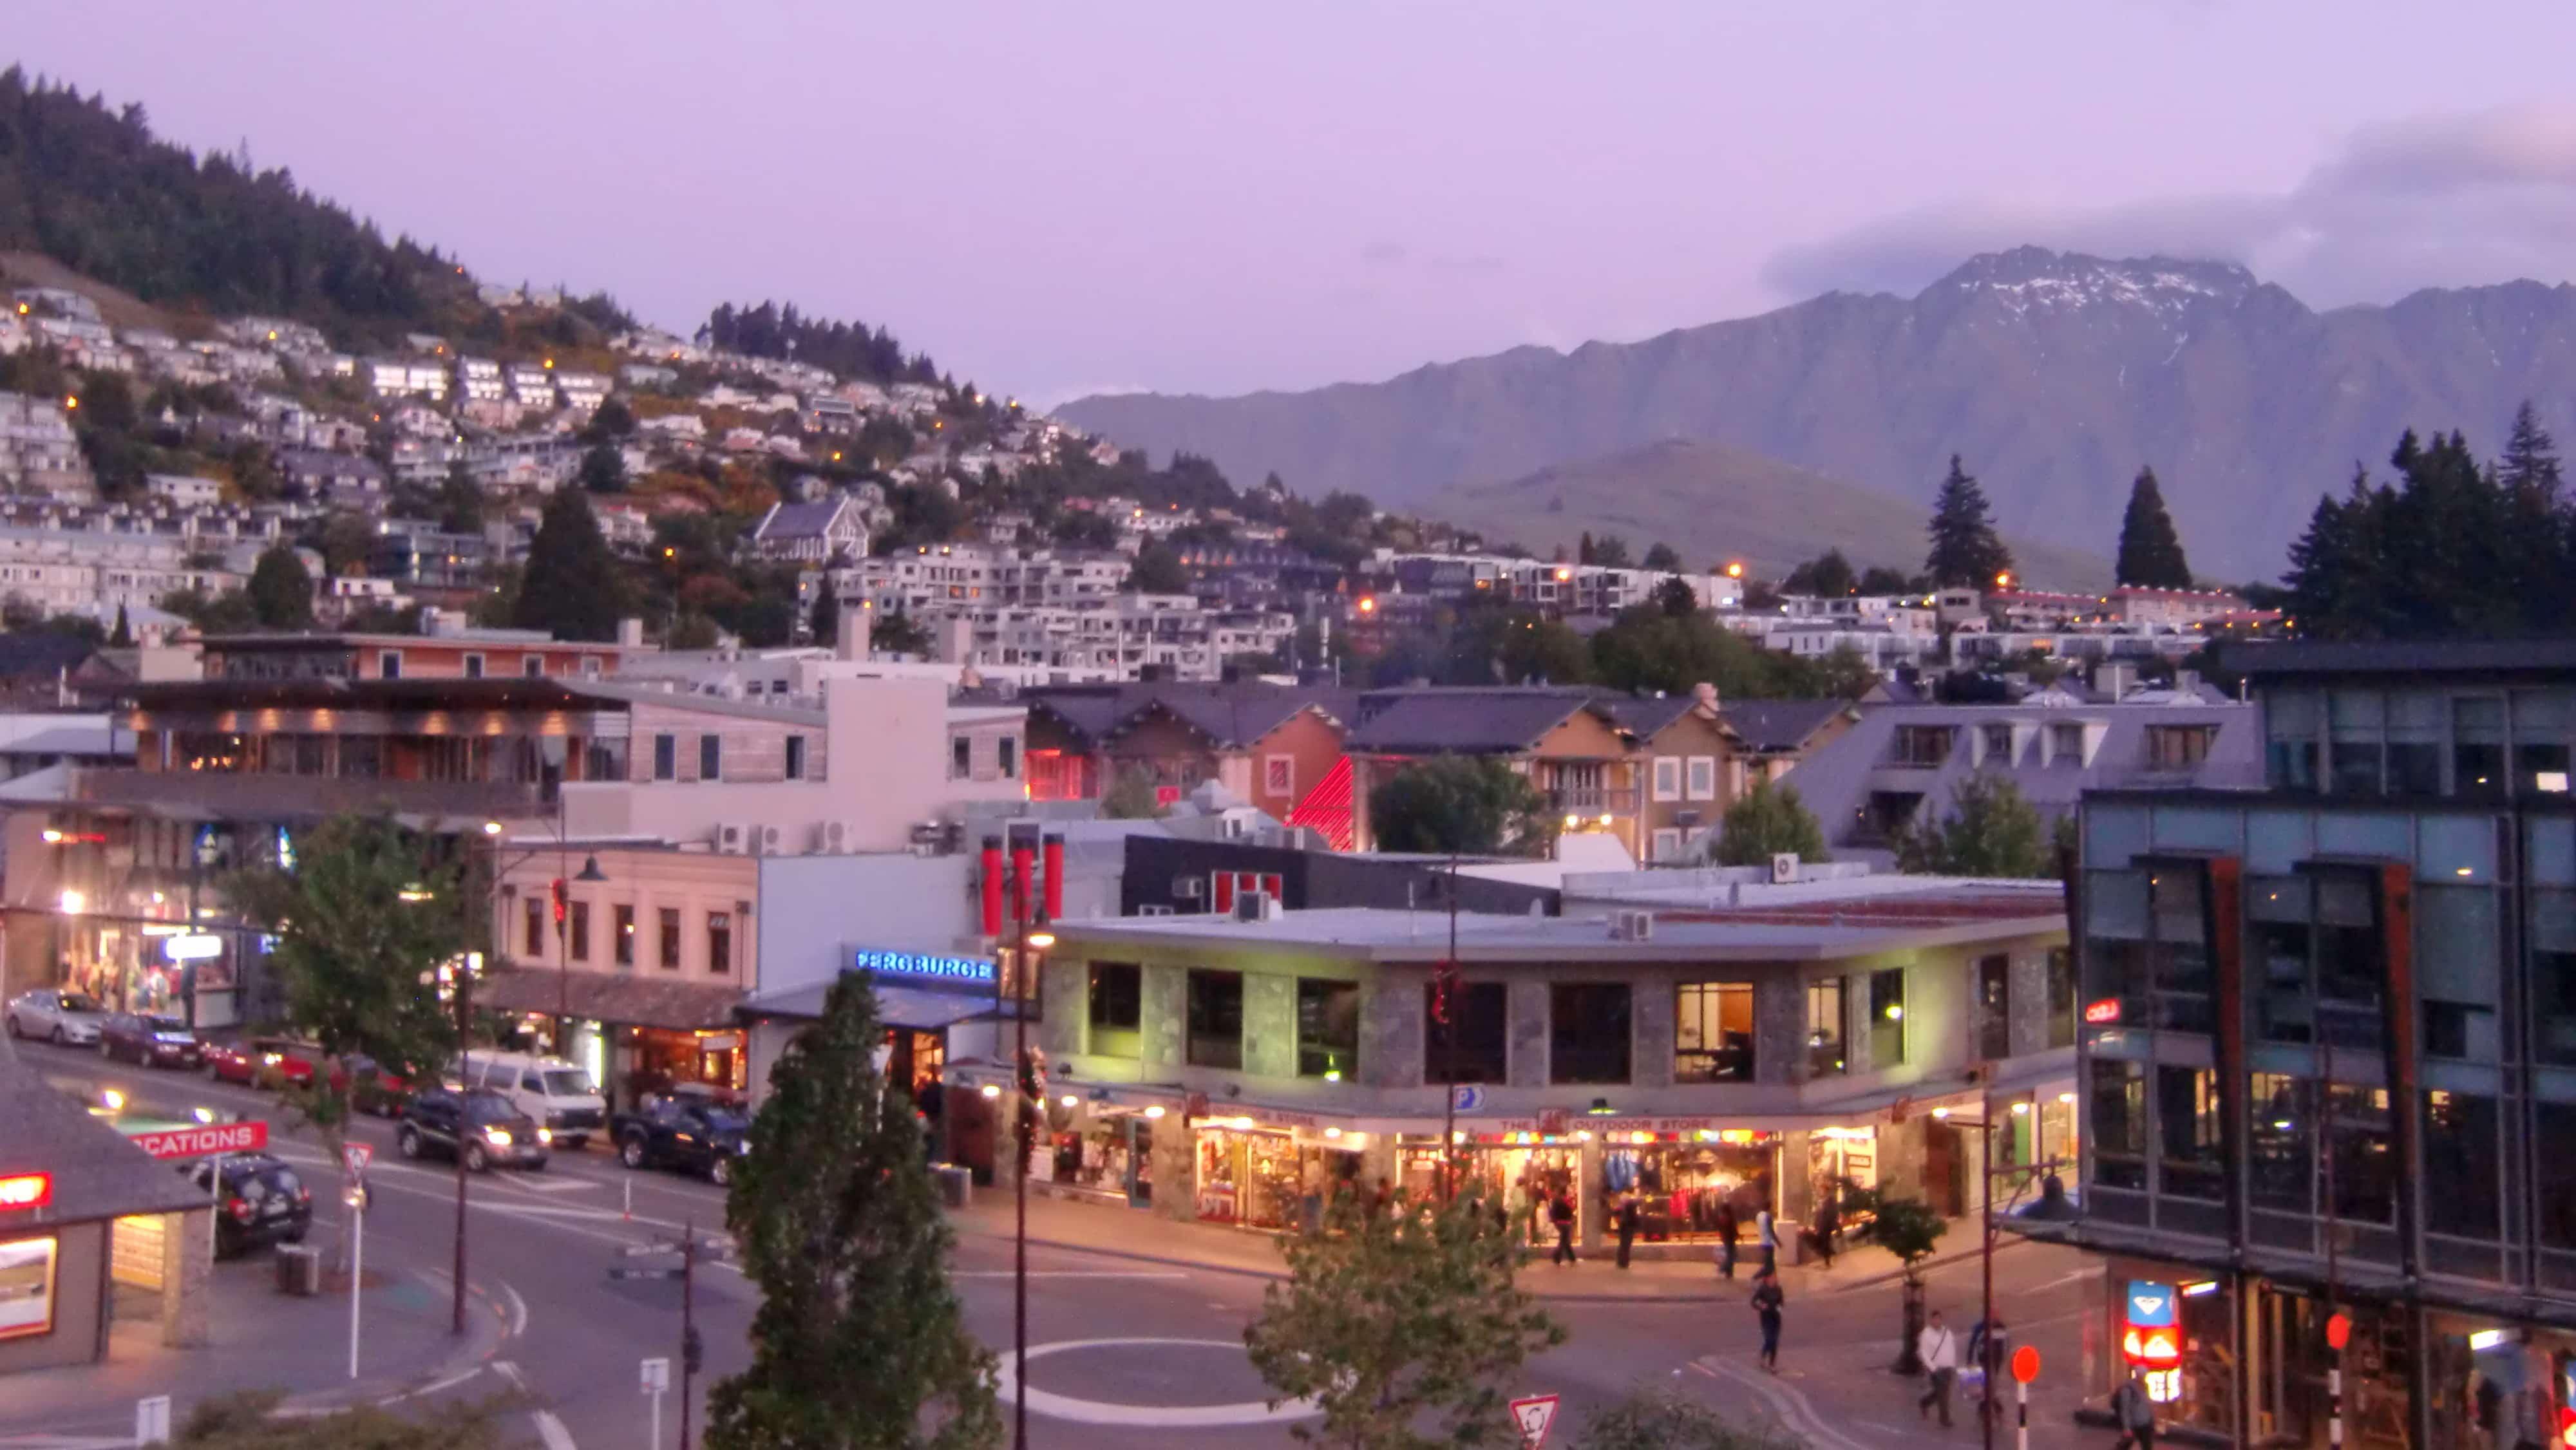 Sonnenuntergang in Queenstown in Neuseeland